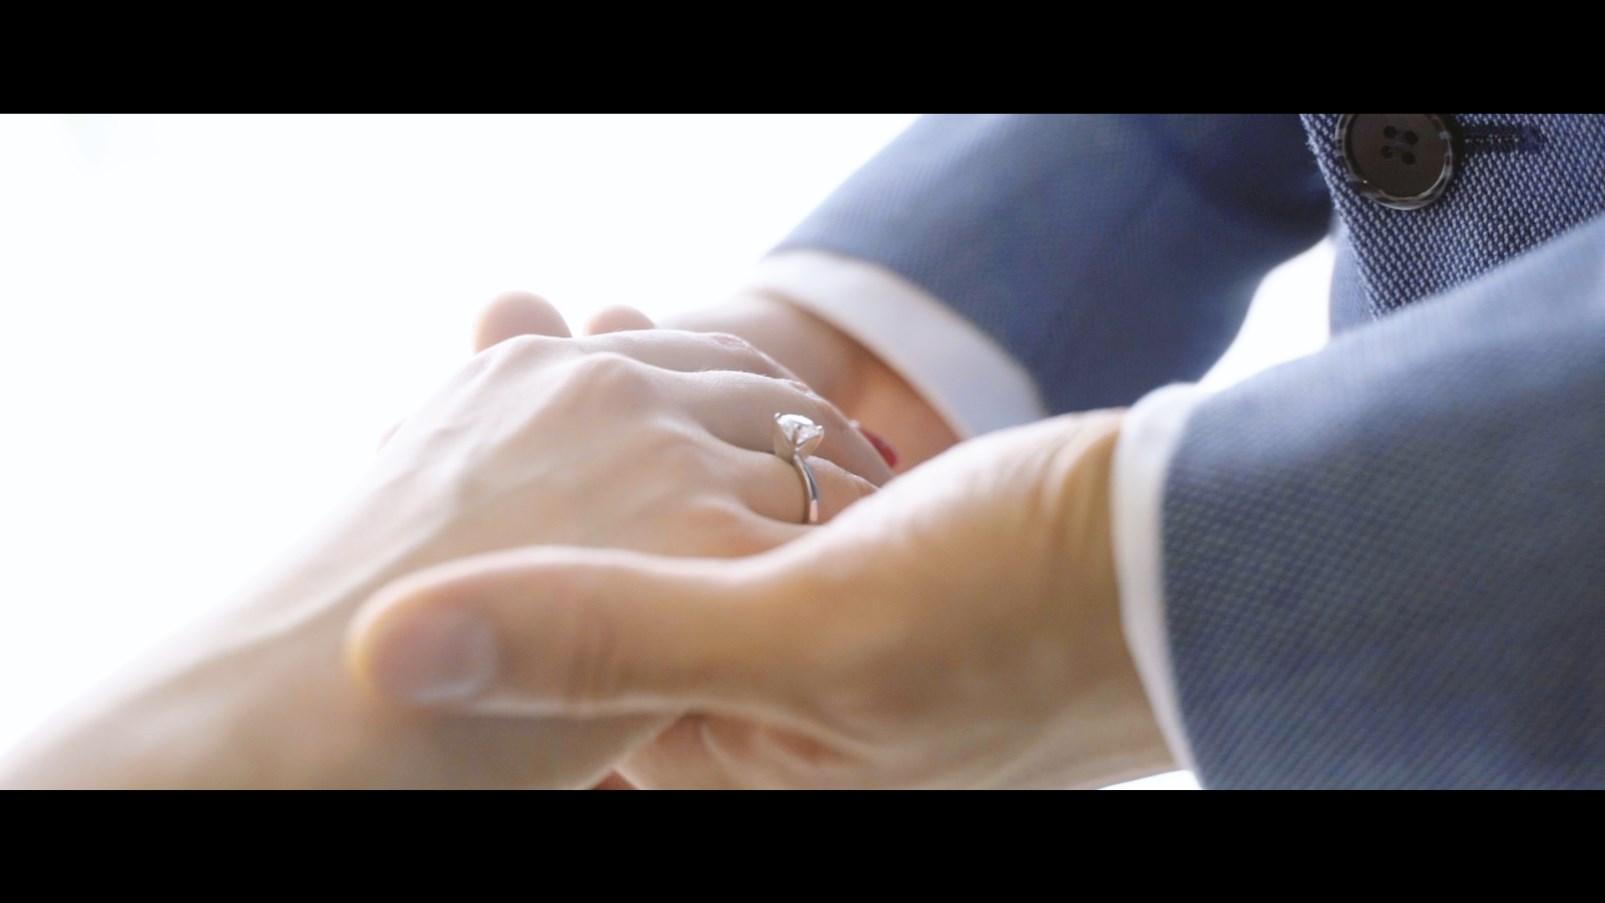 Paul & Chen Wedding Mv 婚禮精華 青青風車莊園.mp4_snapshot_00.27_[2018.12.10_15.35.19]